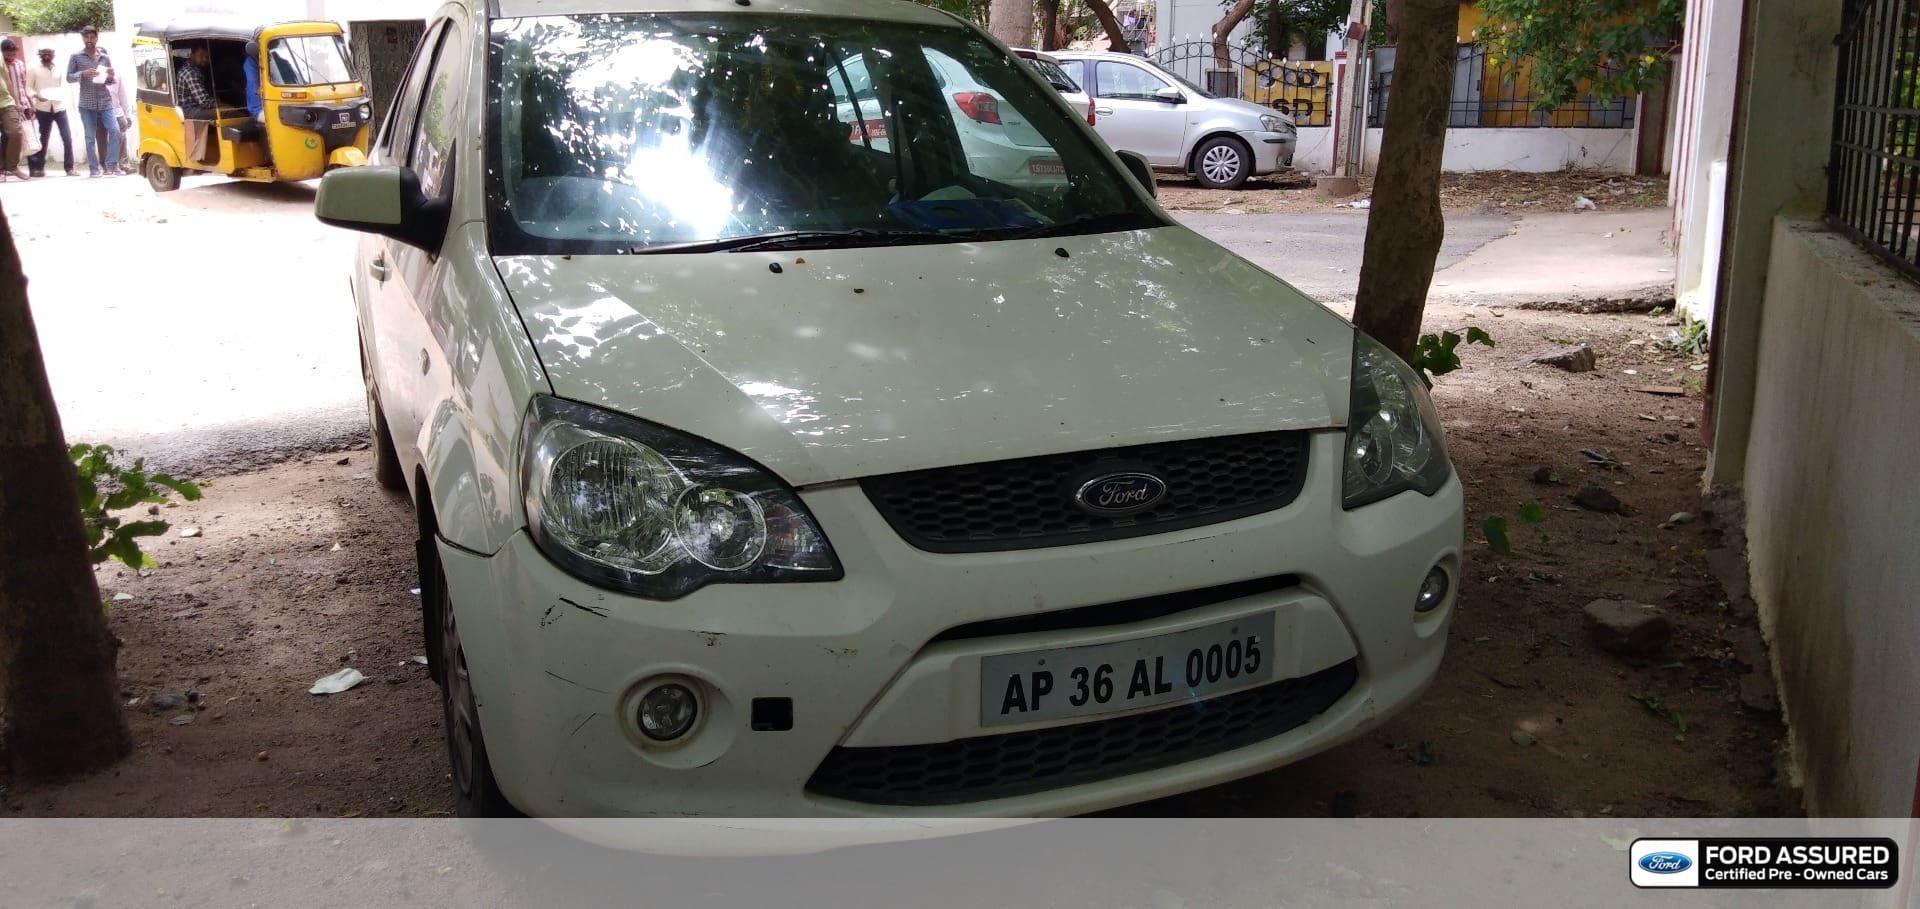 Ford Fiesta Classic 1.4 Duratorq LXI